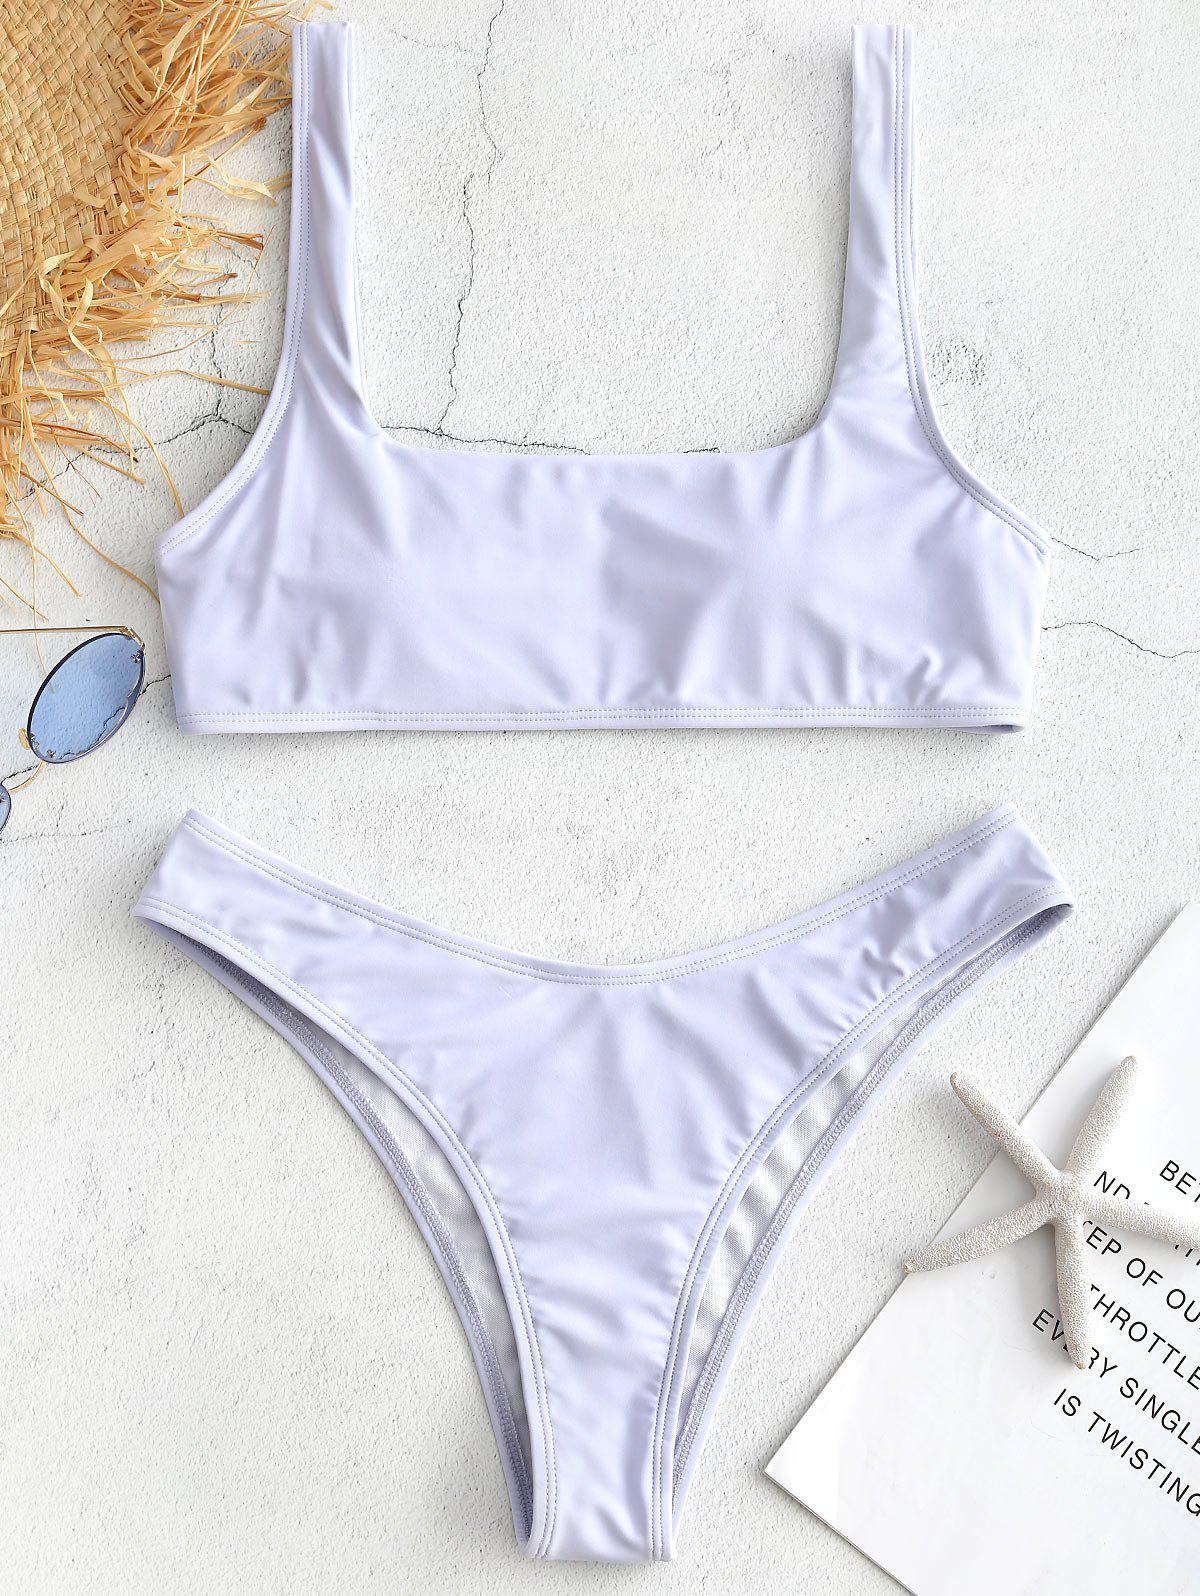 ZAFUL Square Collar Tank Bikini Set, Lavender blue